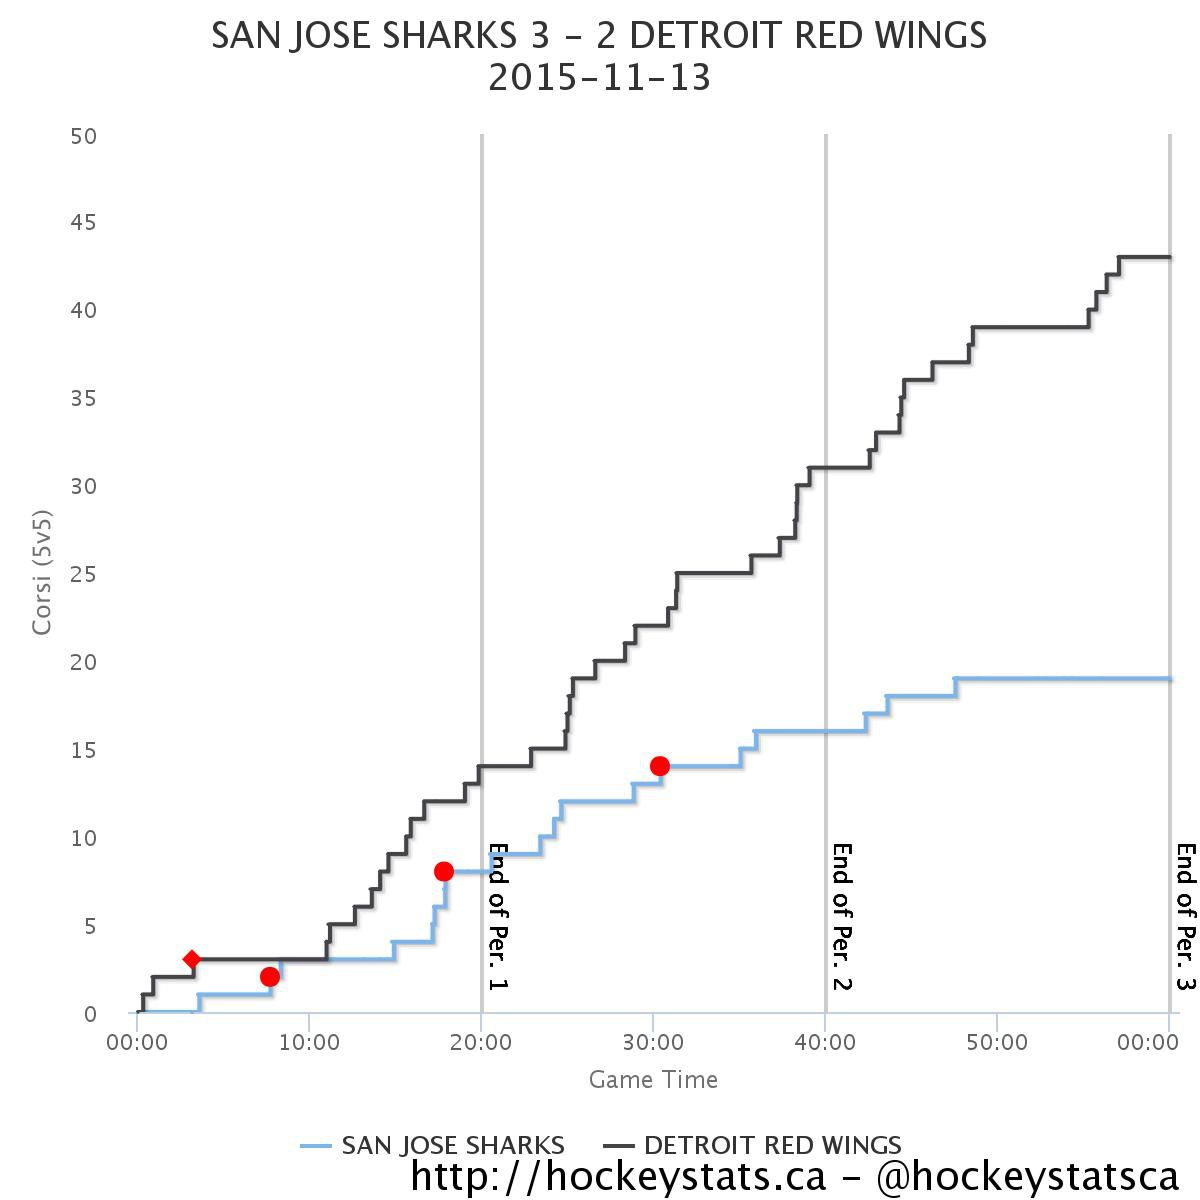 Sharks v. Wings Corsi